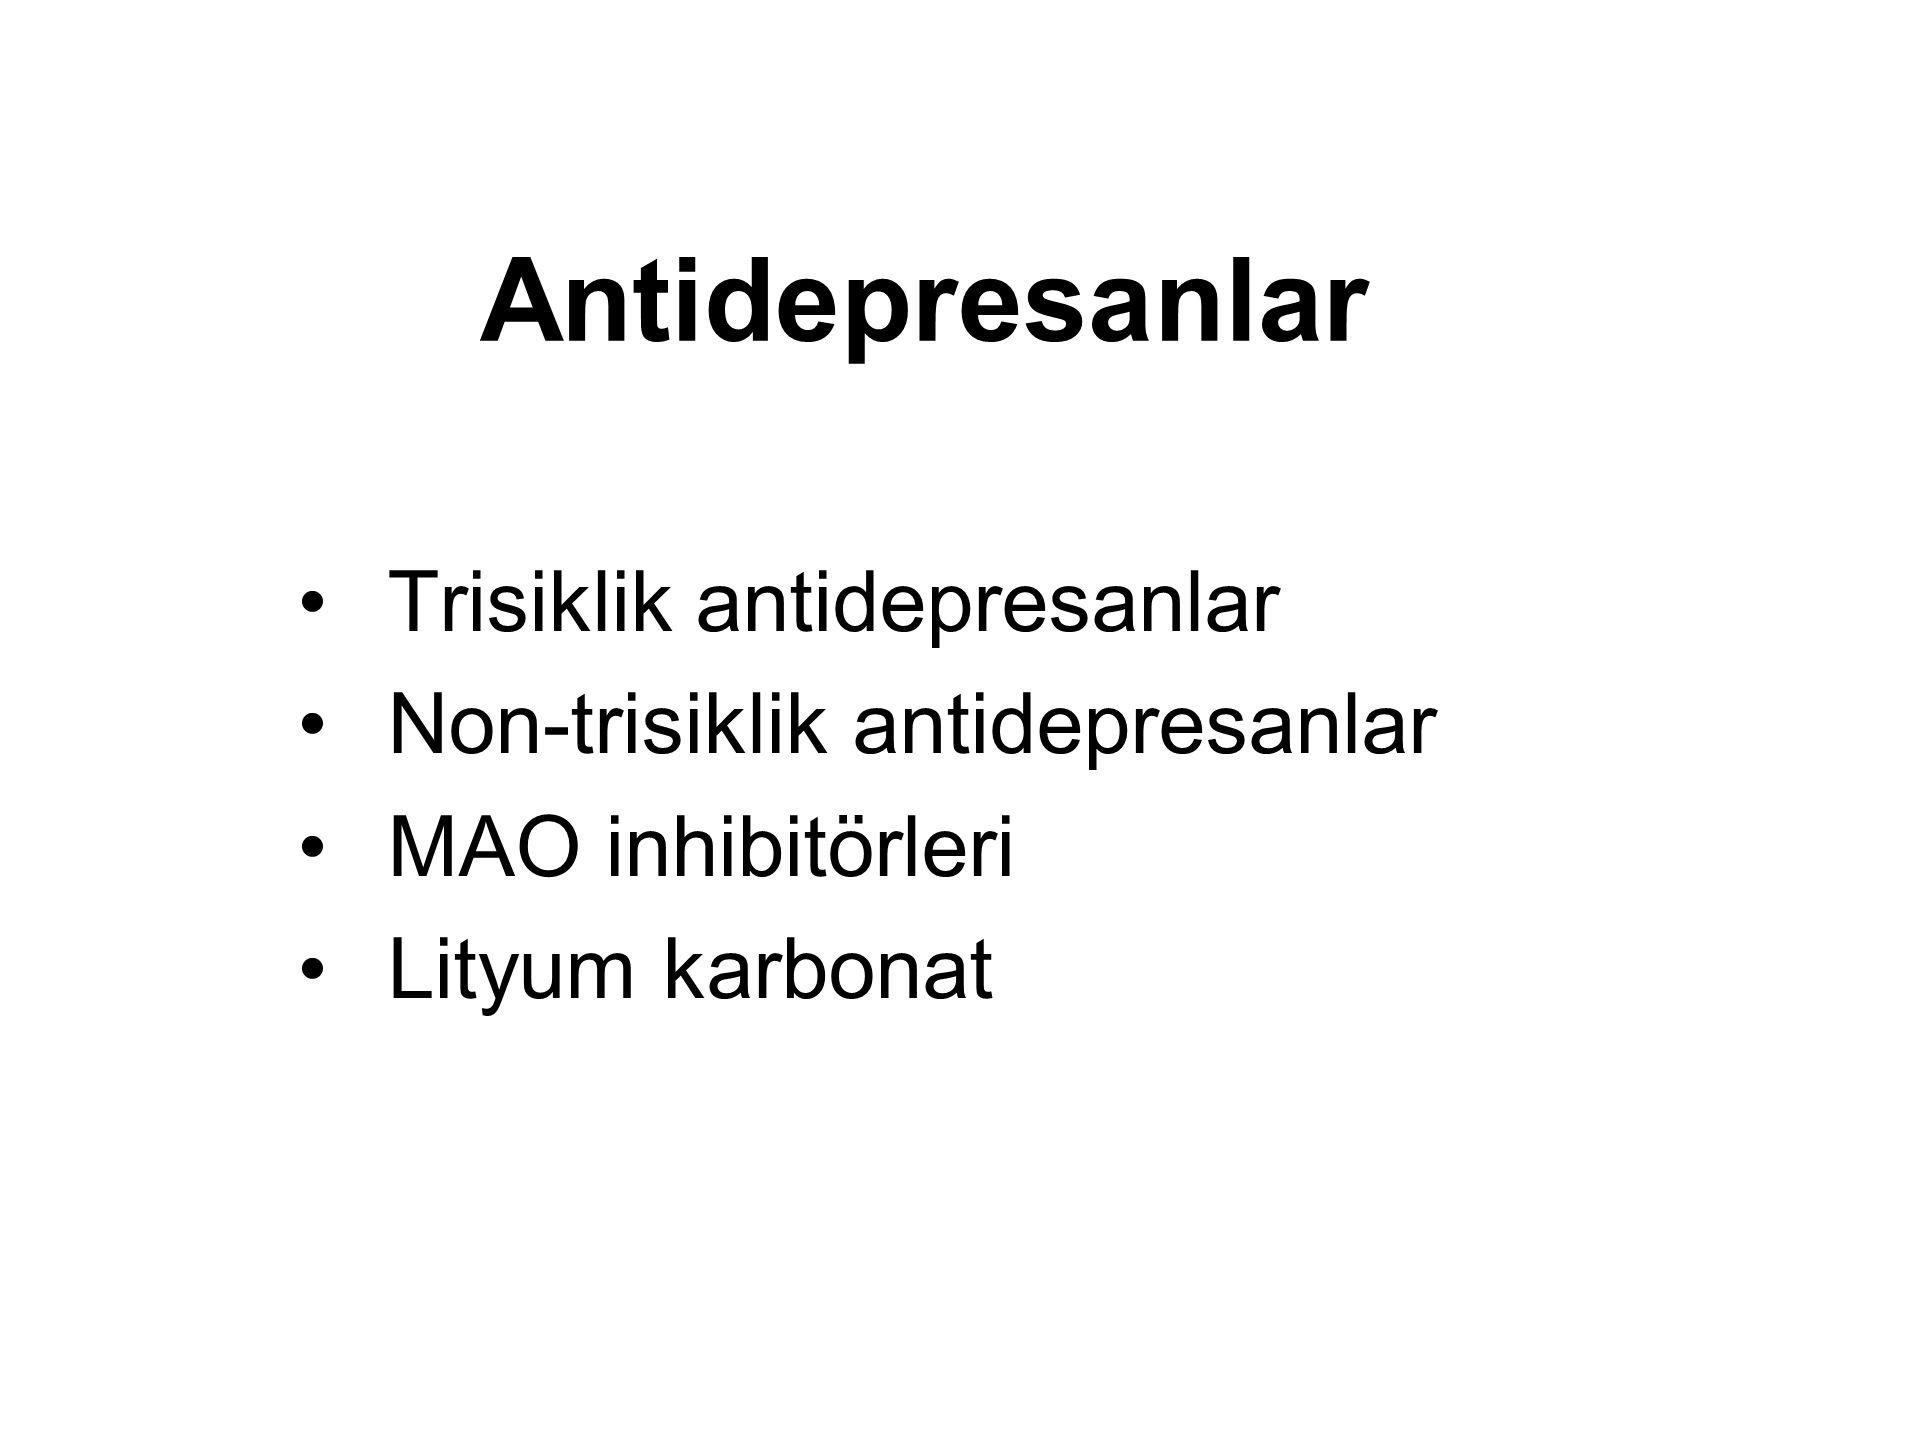 Antidepresanlar Trisiklik antidepresanlar Non-trisiklik antidepresanlar MAO inhibitörleri Lityum karbonat